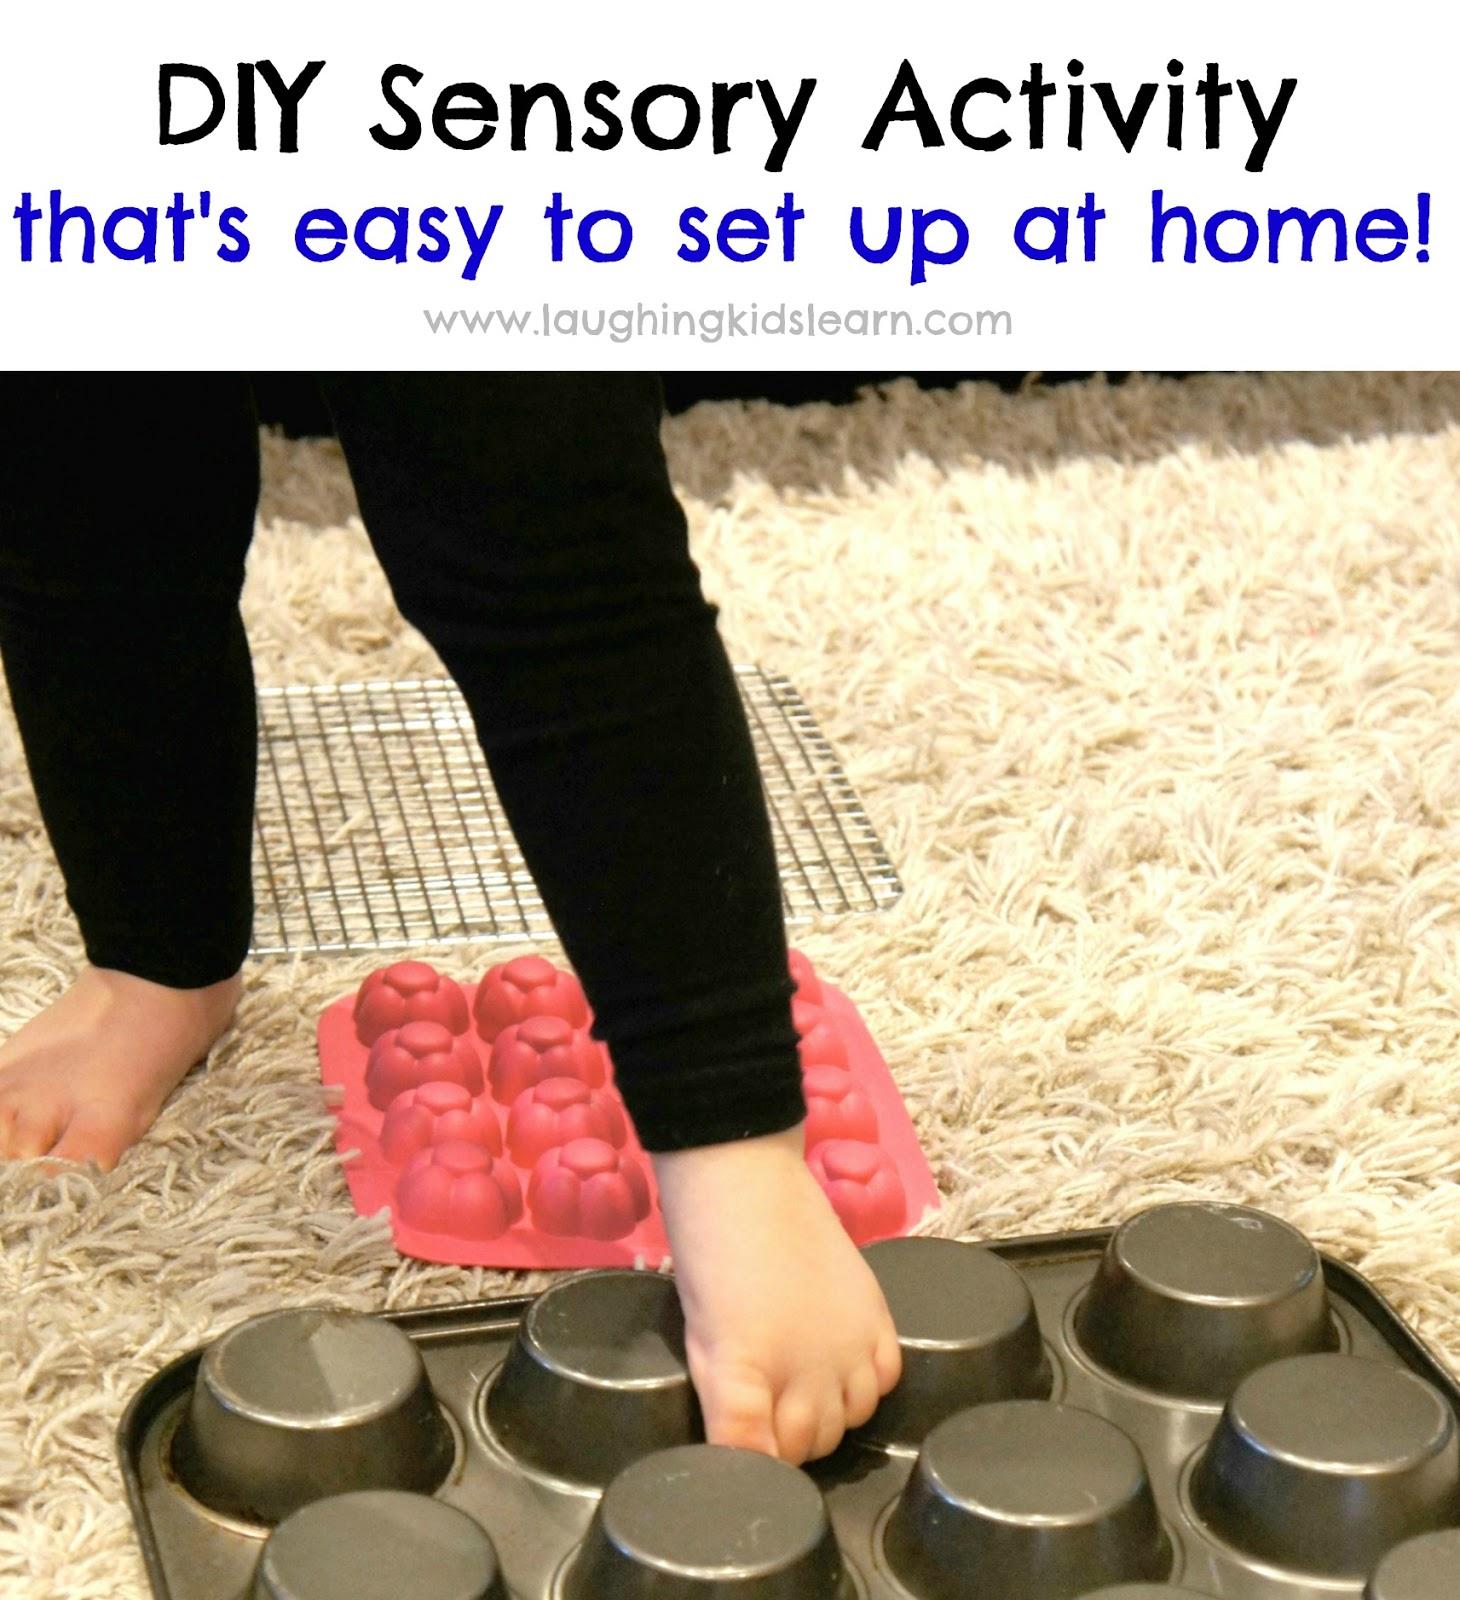 DIY Sensory Activity with easy home set